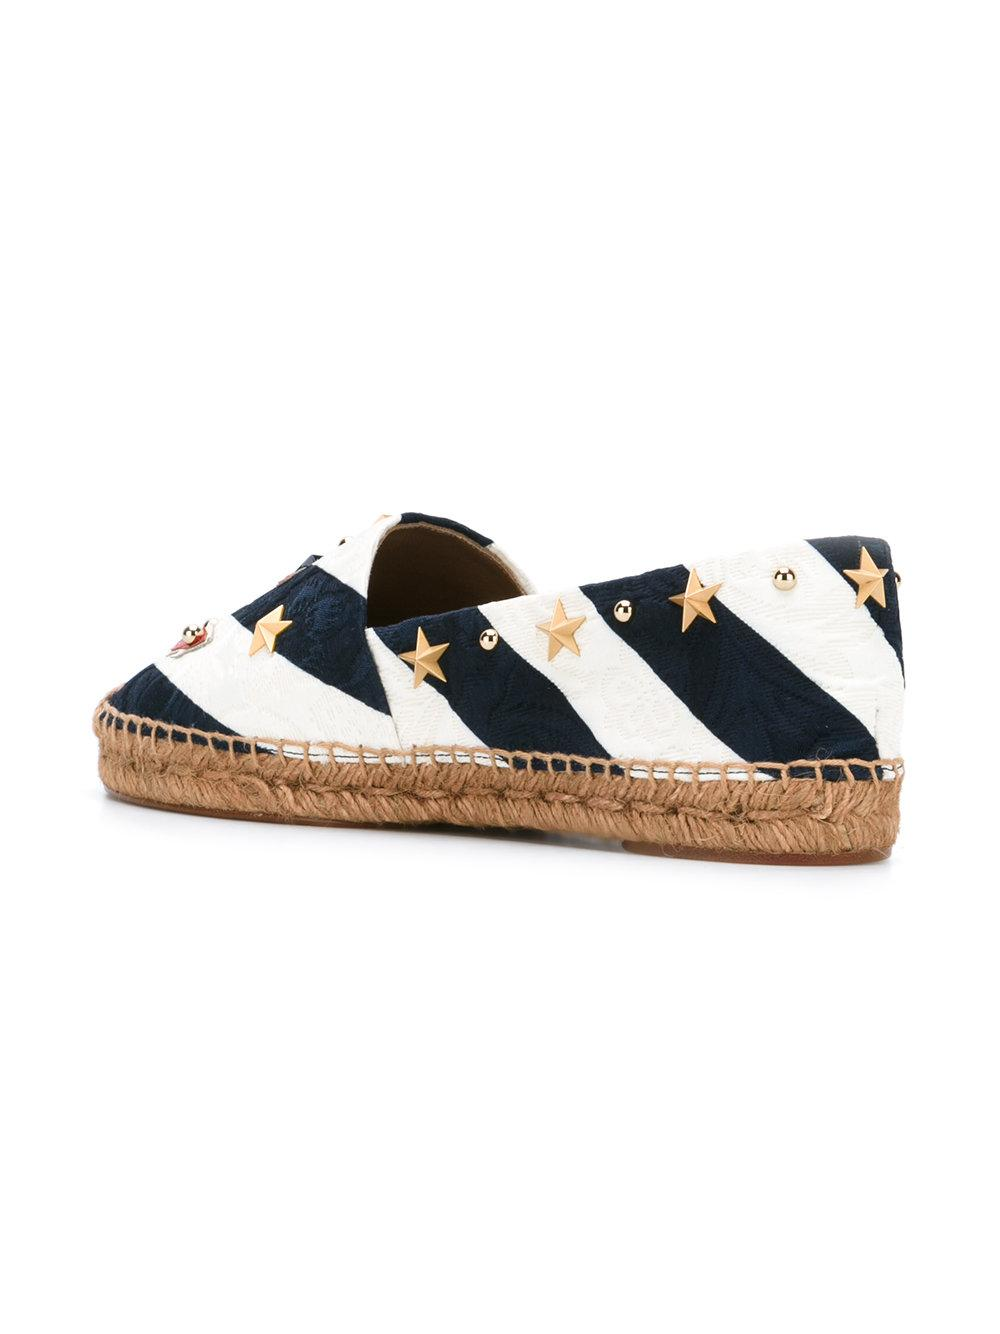 anchor striped espadrilles - Blue Dolce & Gabbana lHxJd2jjMt